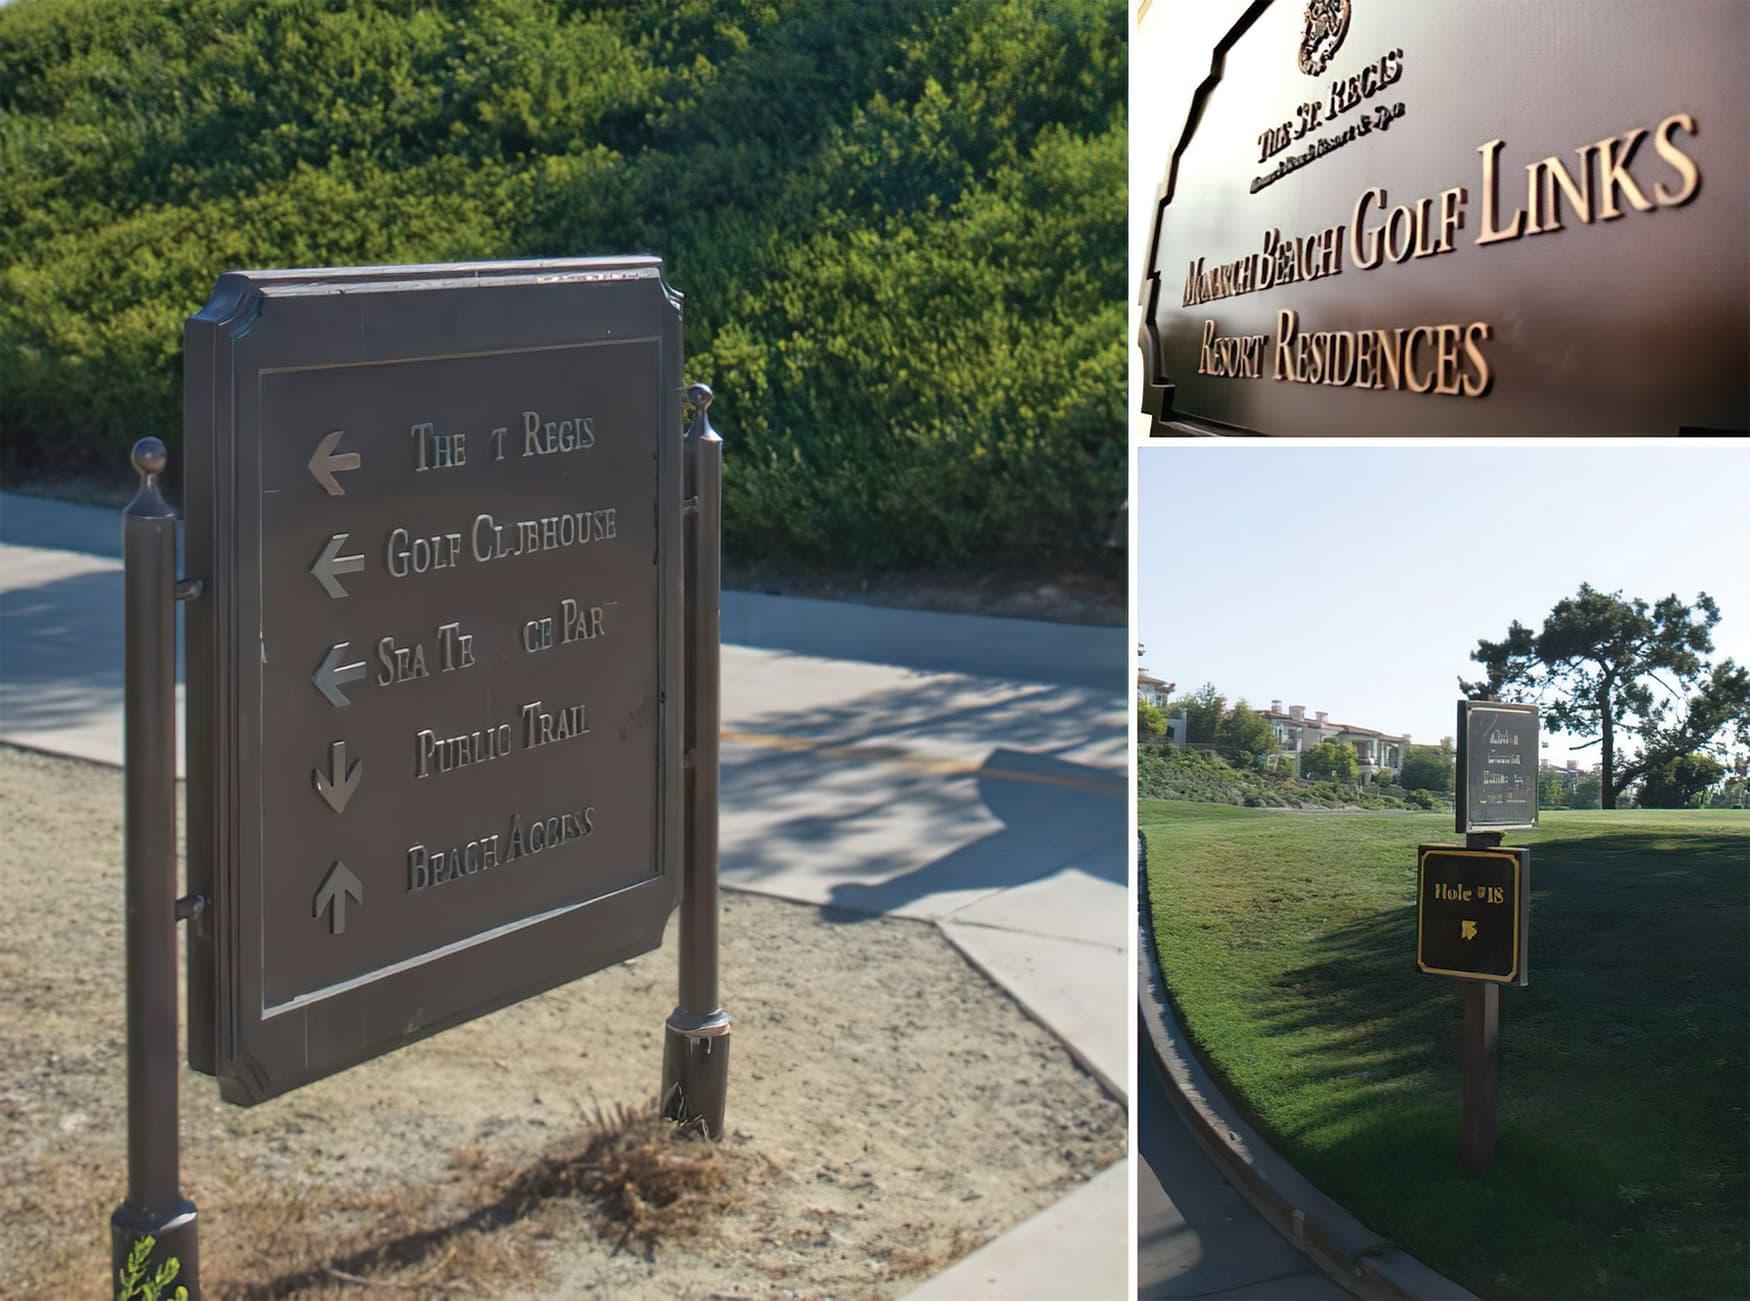 Monarch Beach Masterplan. City of Dana Point, California. Civic Design, Residential Community Signage, Park Wayfinding & Signage.